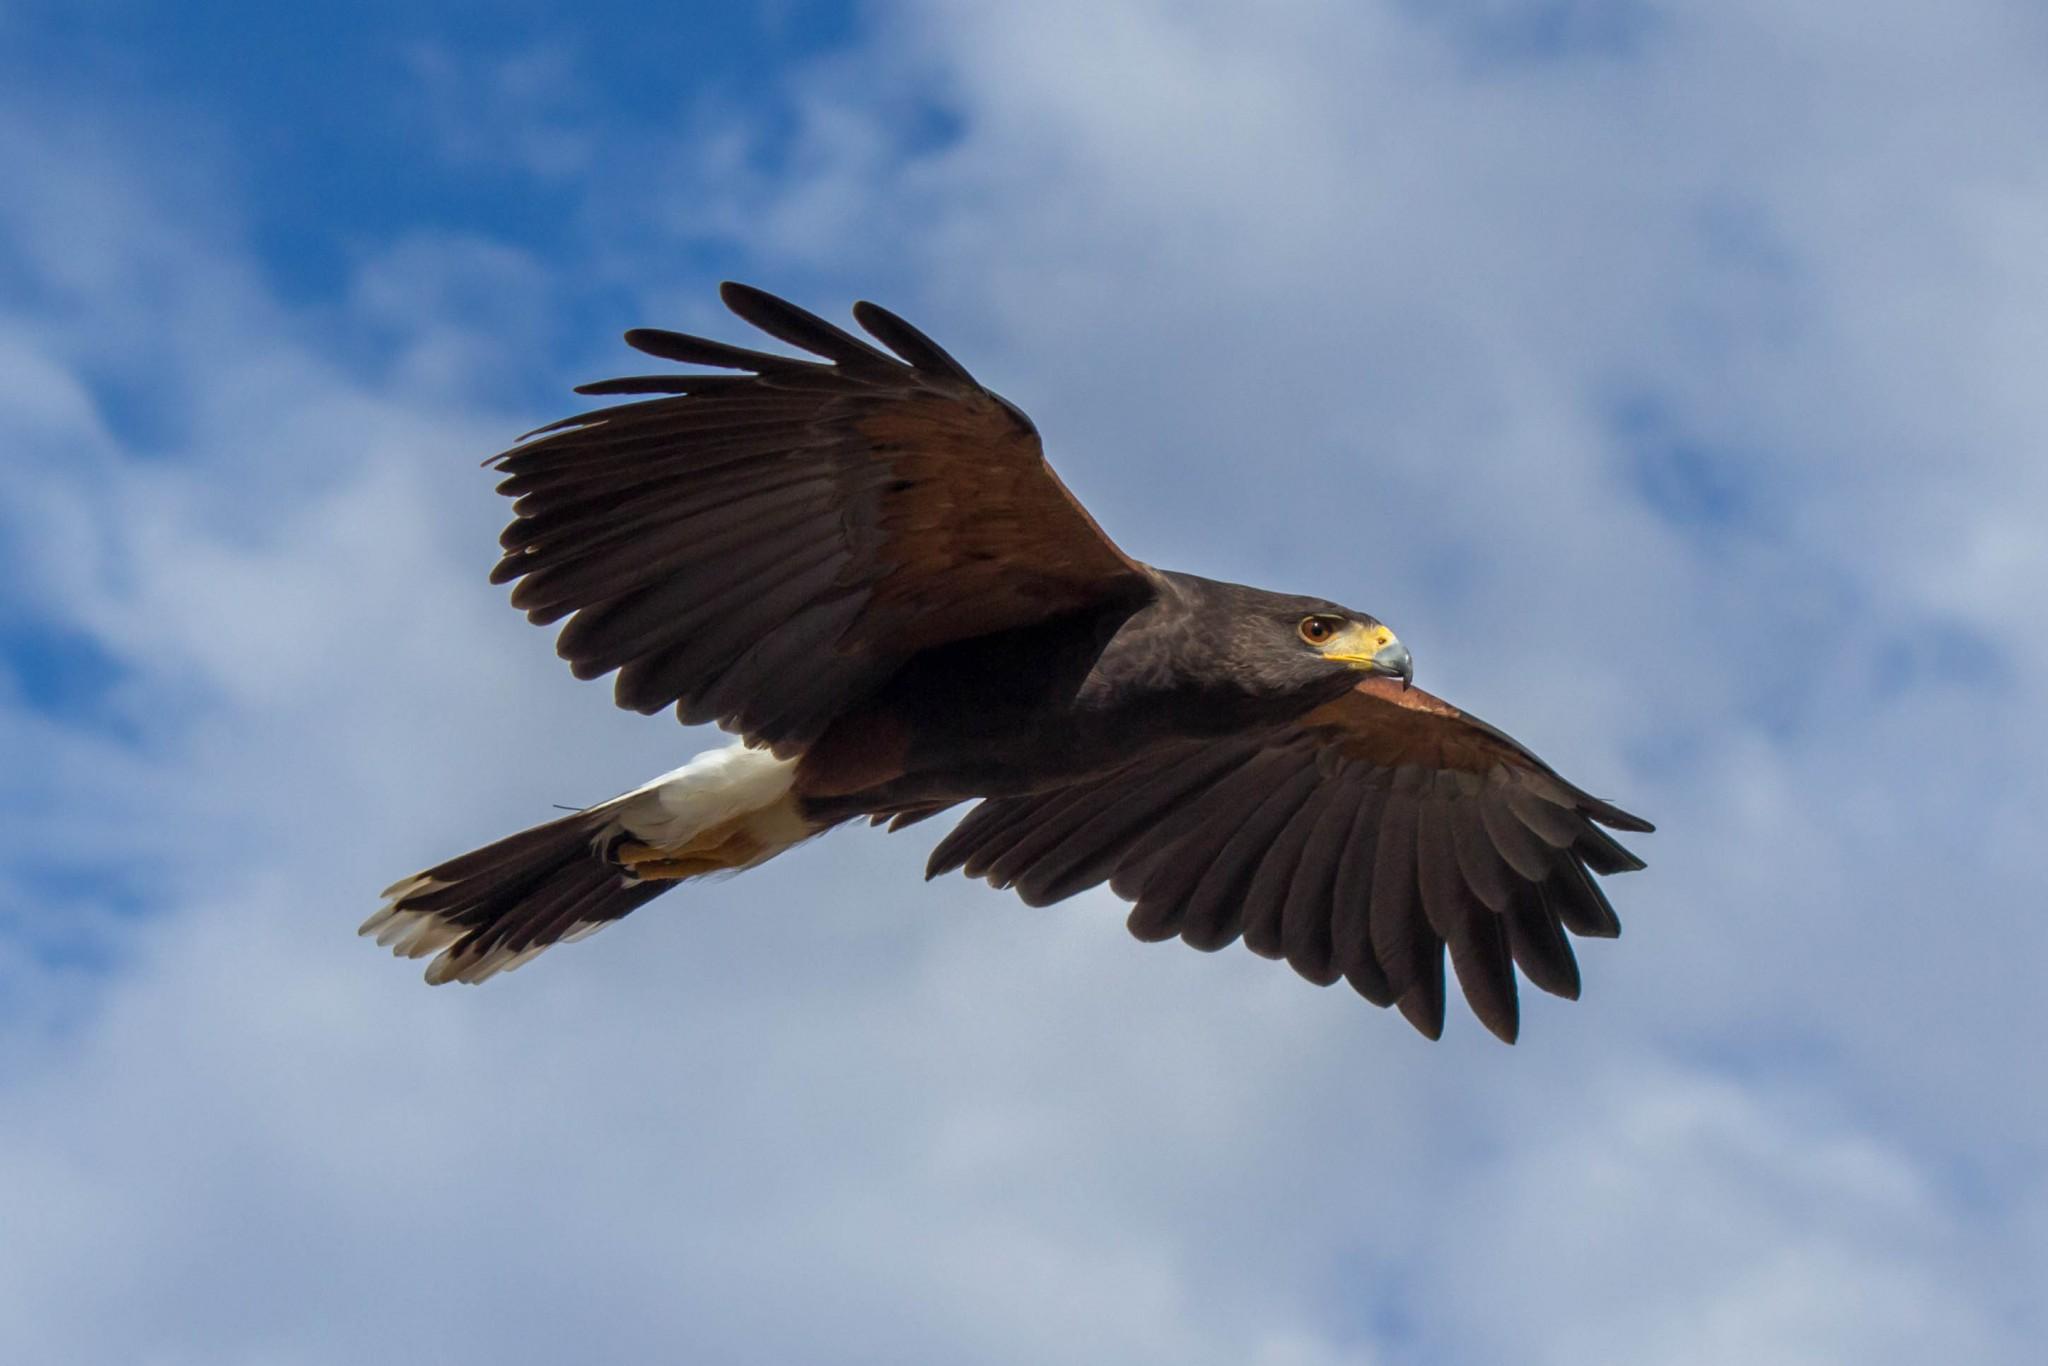 Harris's Hawk @ Sonoran Desert, Arizona